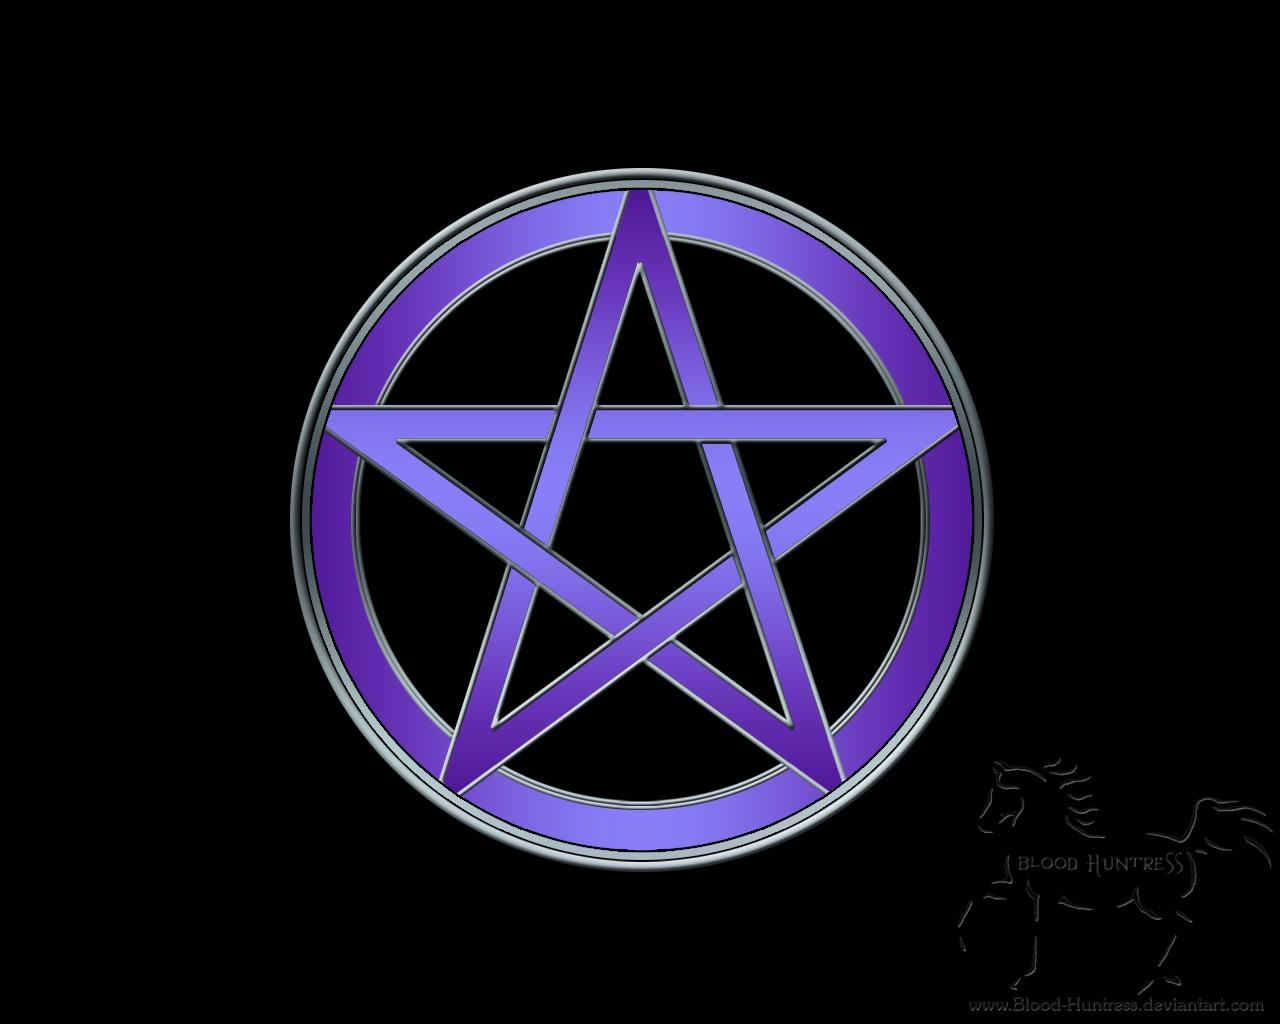 Flames Pentacle Blood Huntress 1280x1024